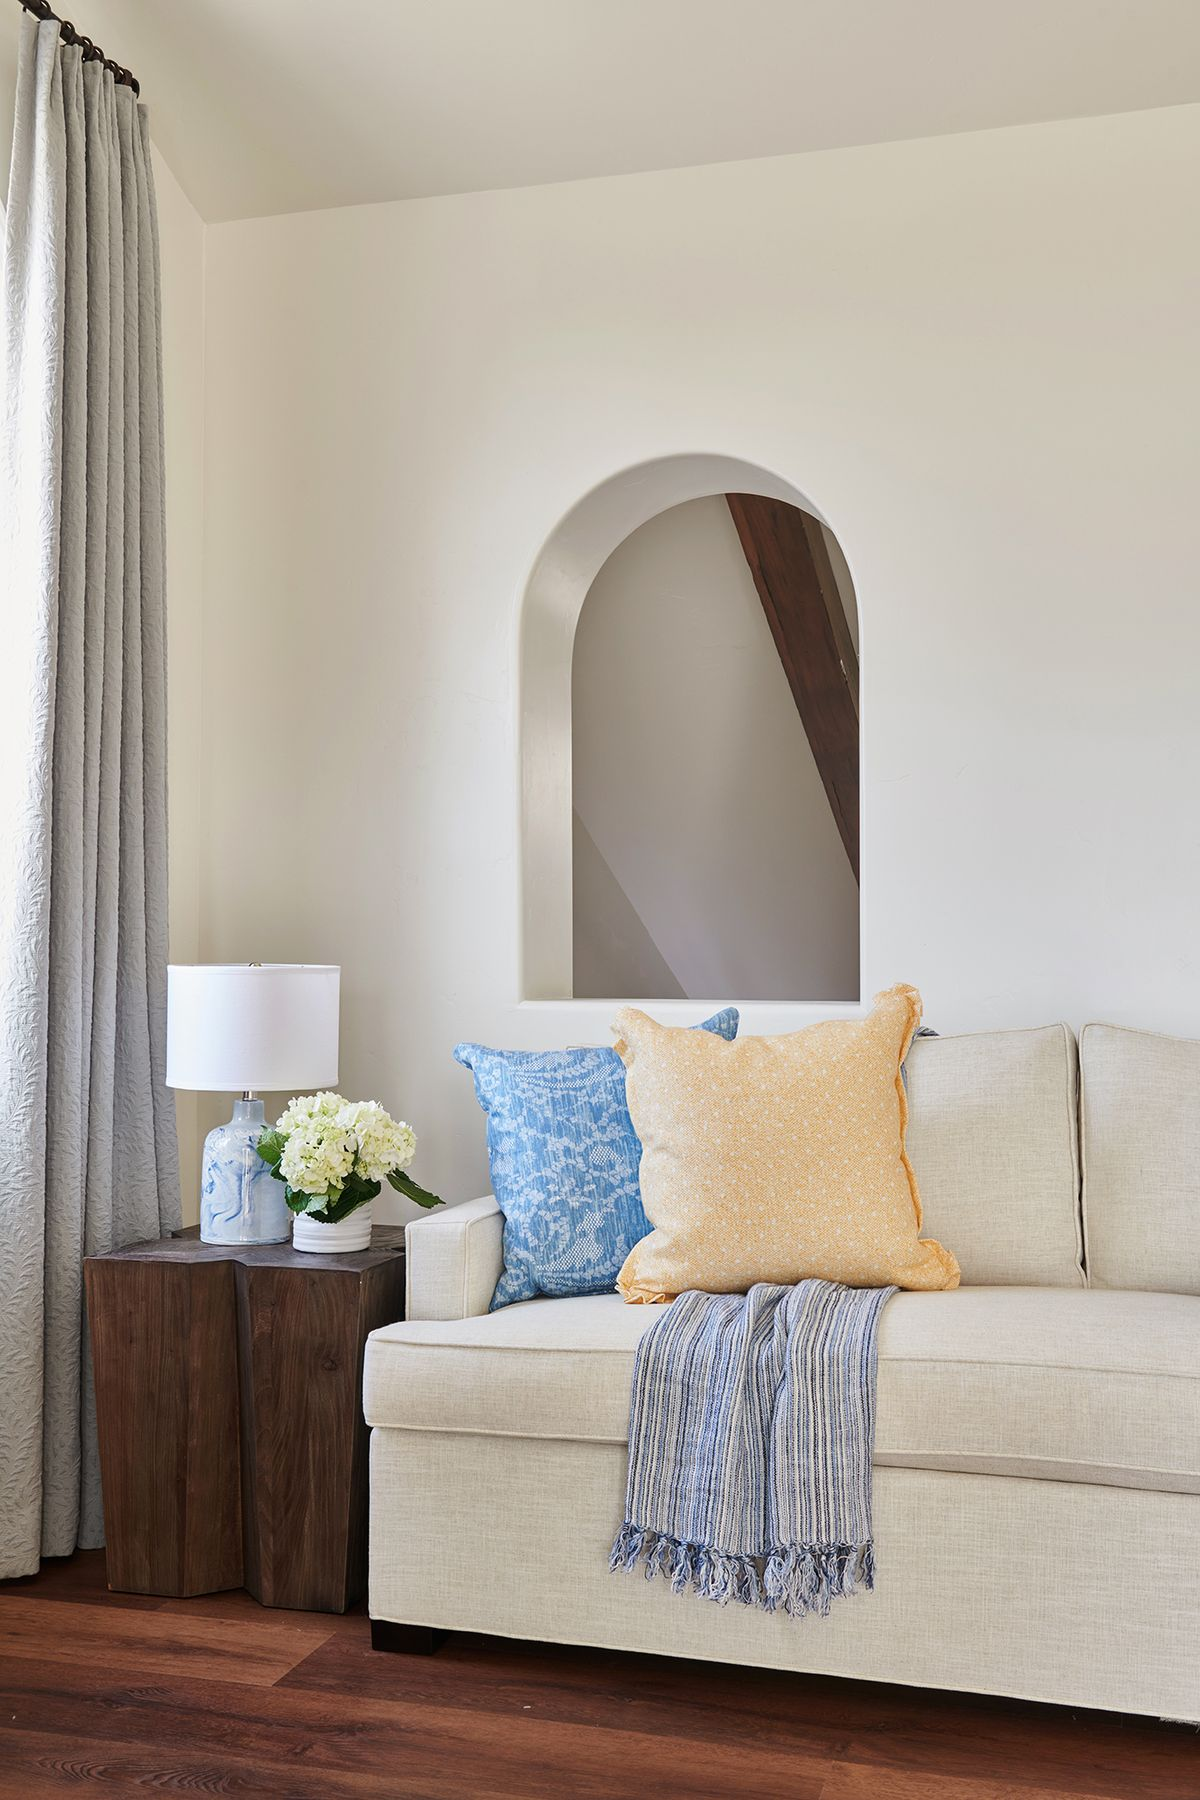 014 Interior Photography Portfolio of Architectural Photographer Peter Christiansen Valli - Kelly Ferm 8th Street.jpg